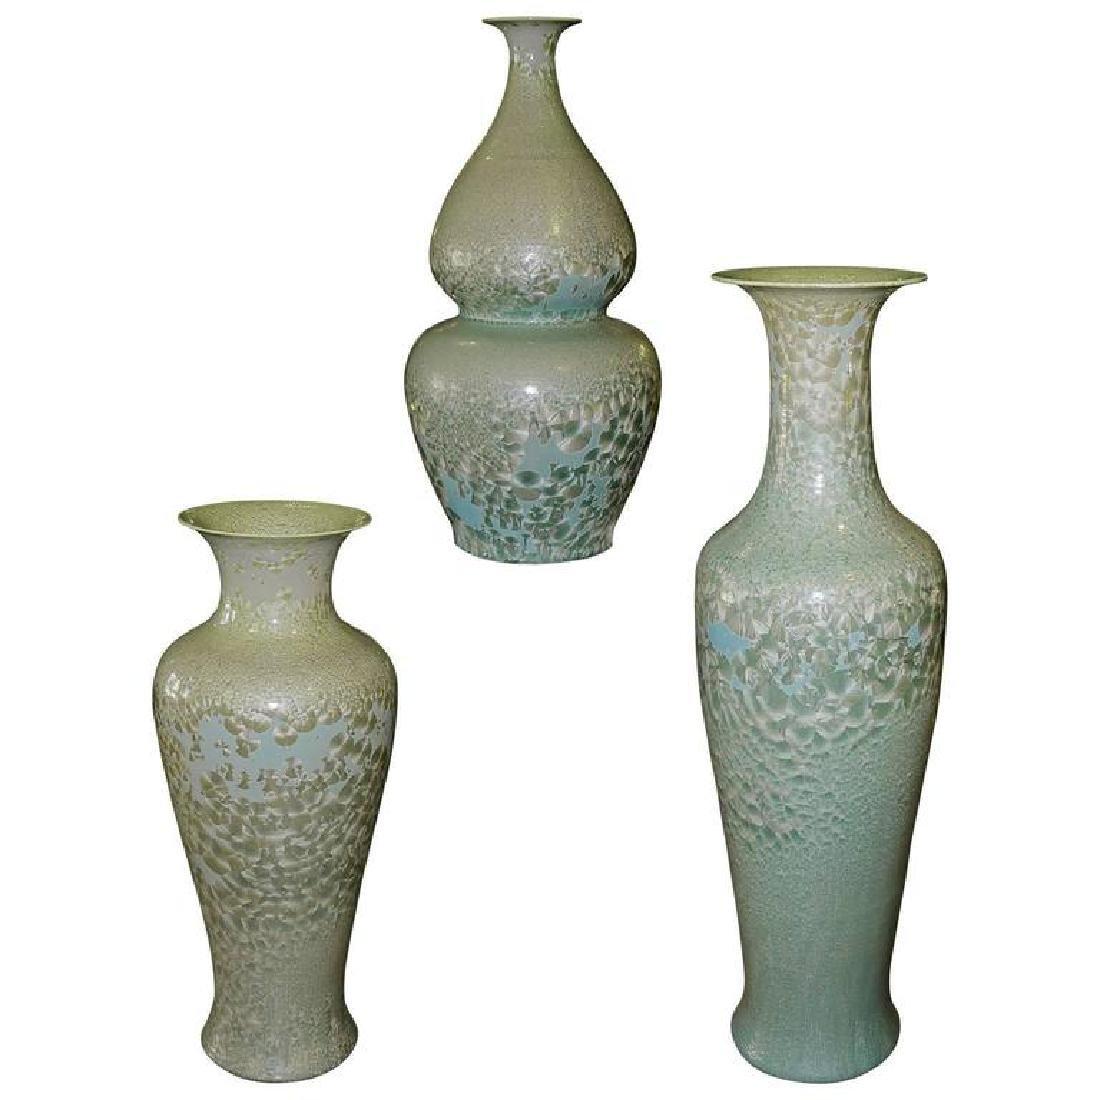 Set of Three Celadon Porcelain Floor Vases